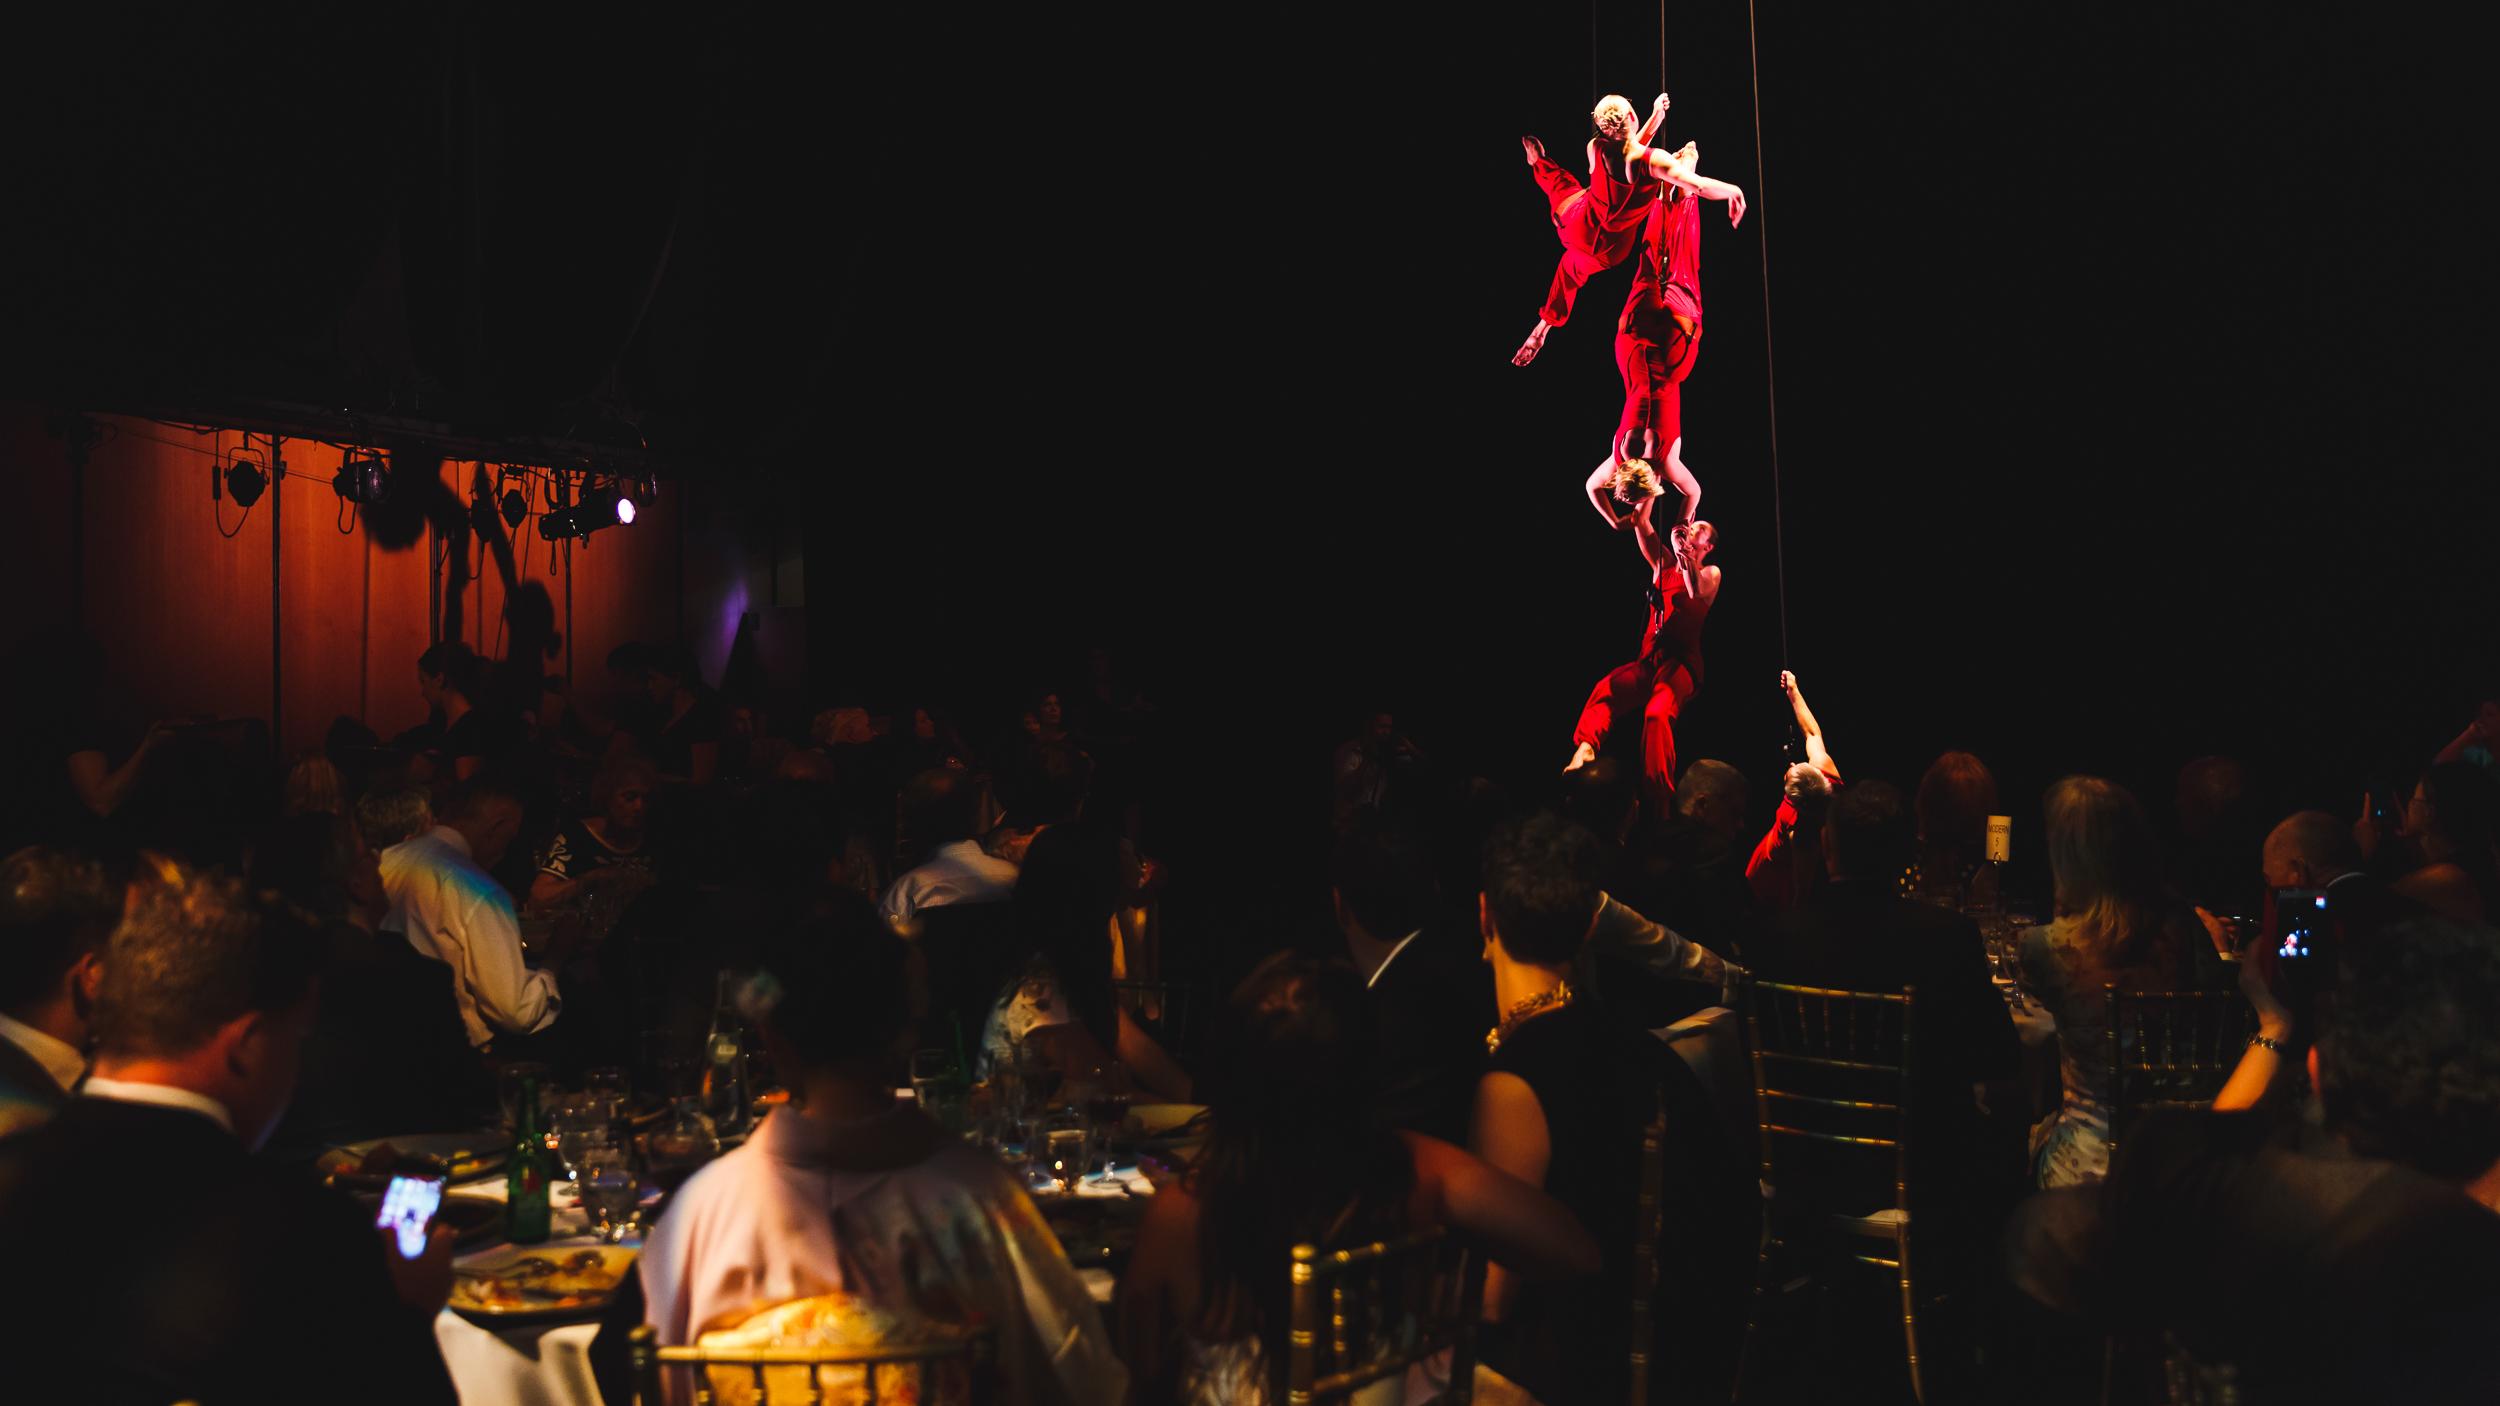 Scotiabank-Dance-Hotel-image9.jpg